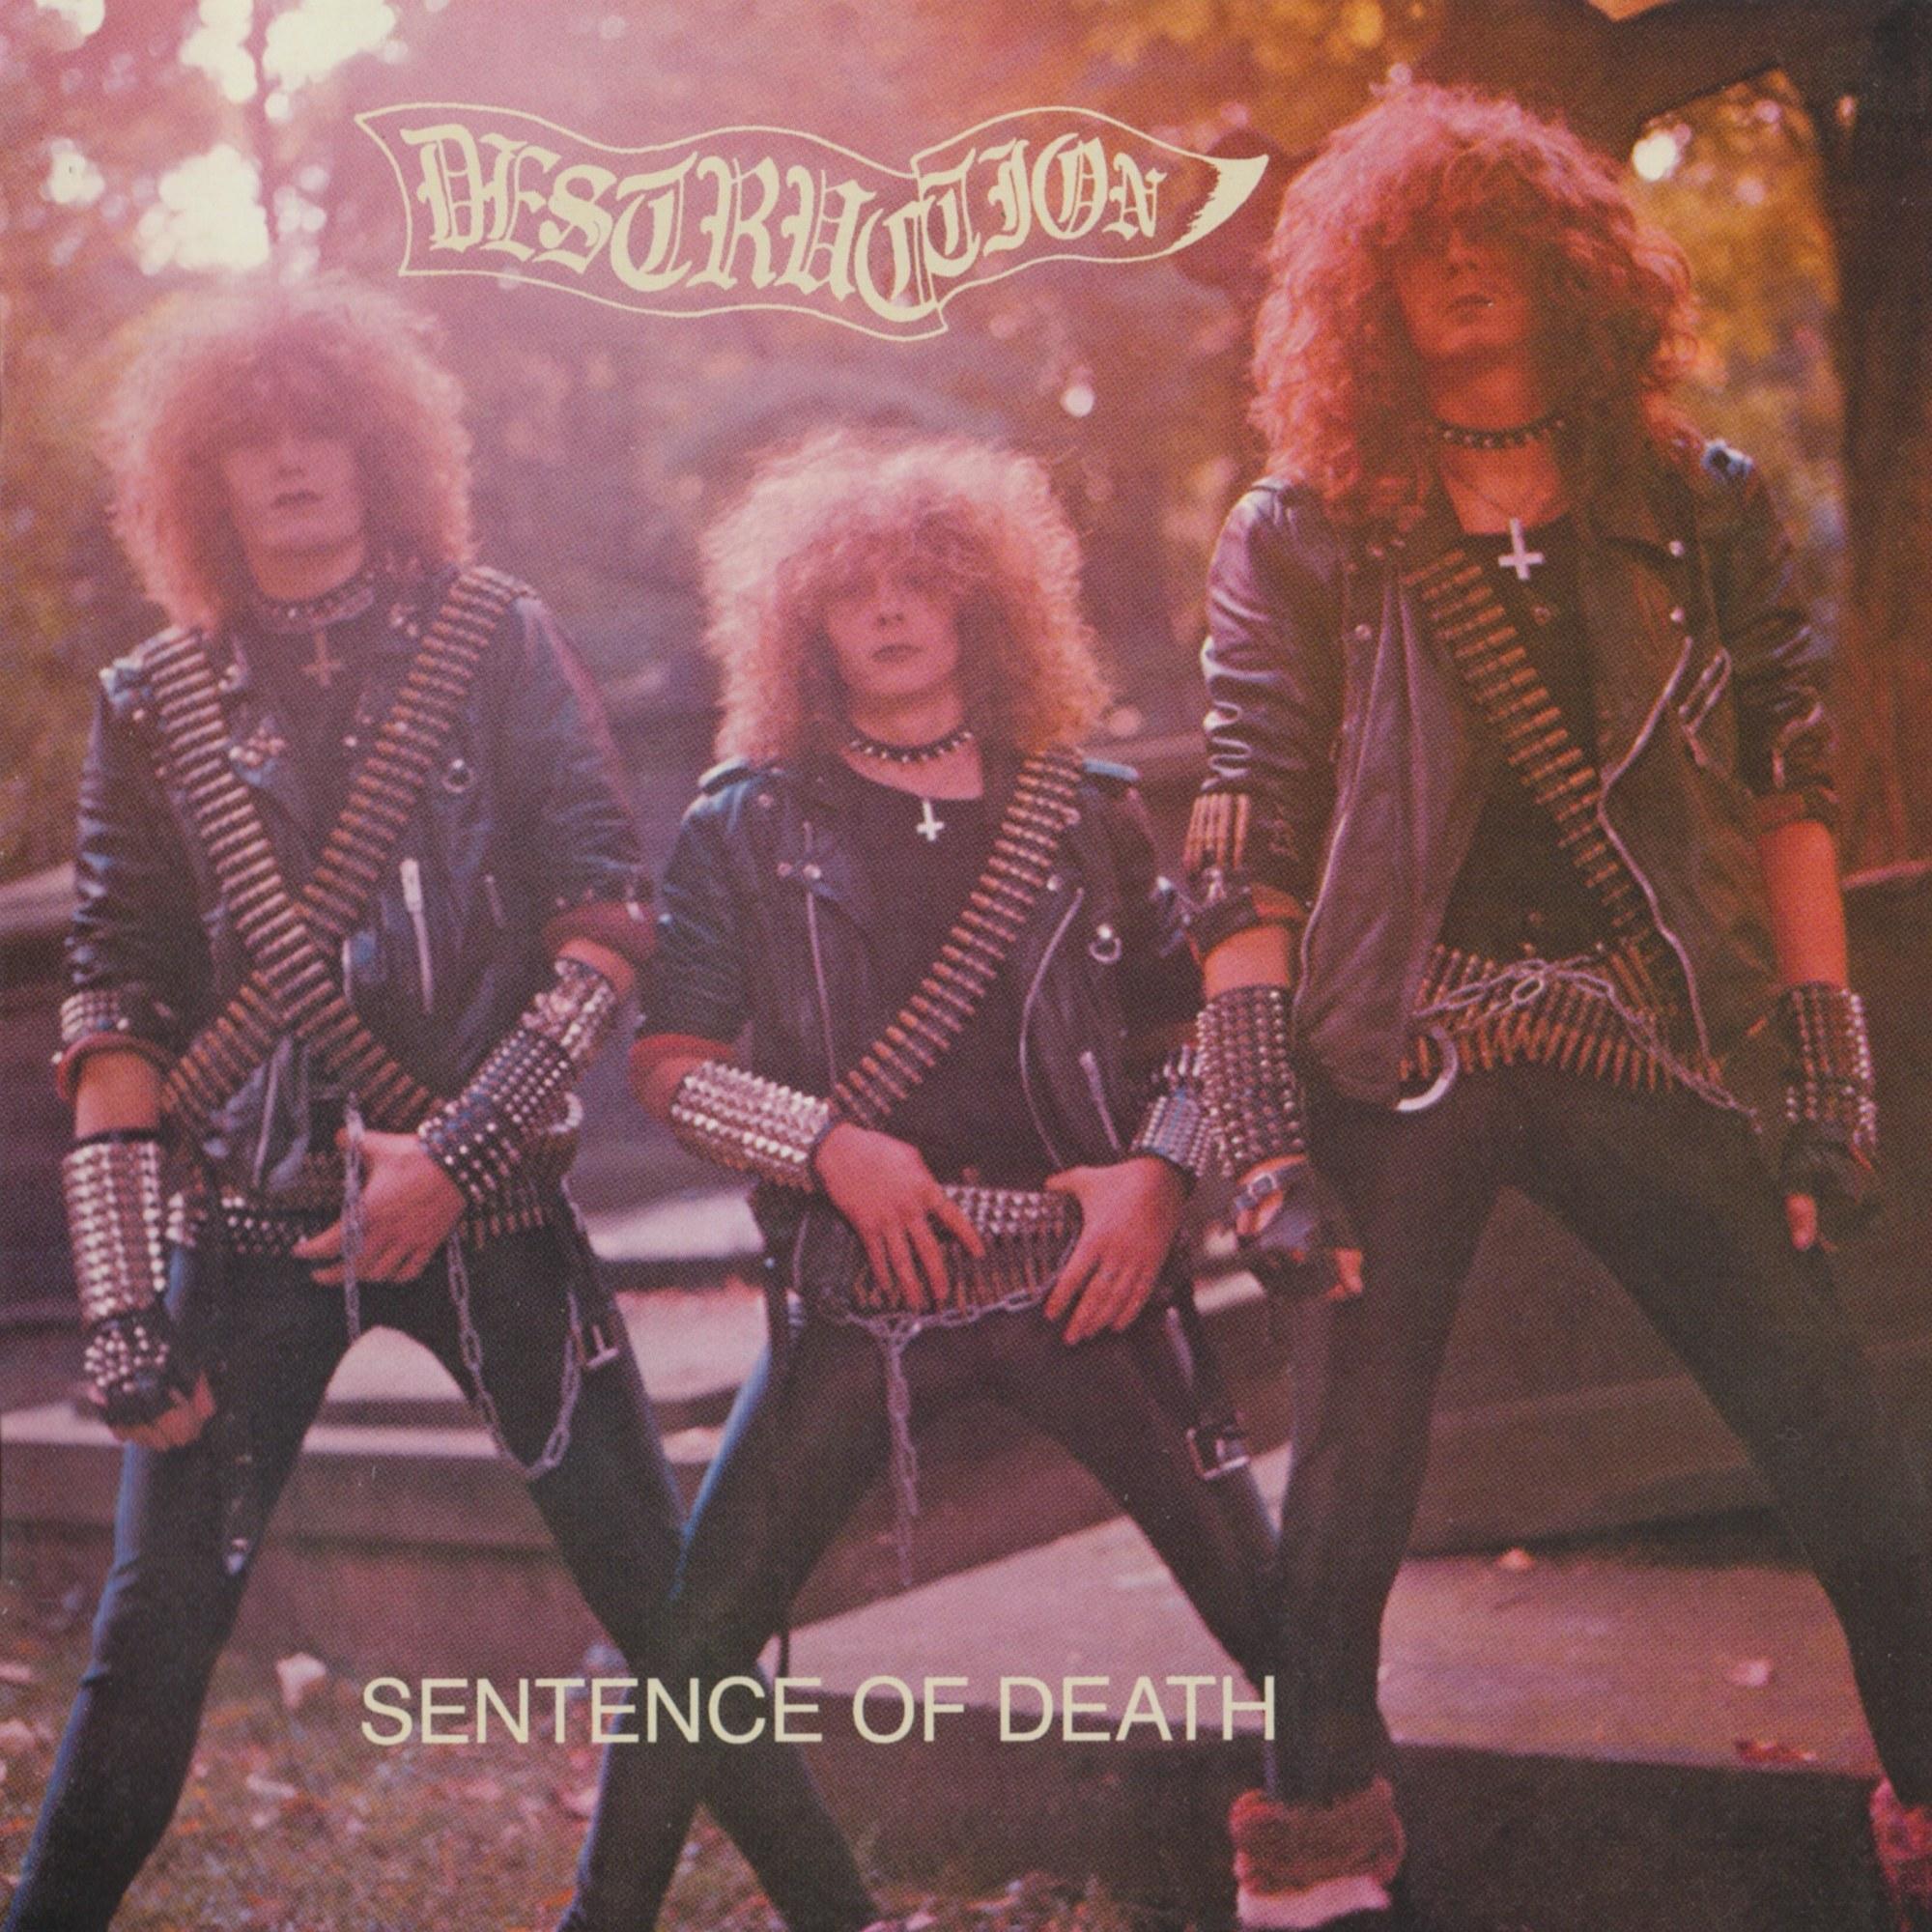 Review for Destruction - Sentence of Death